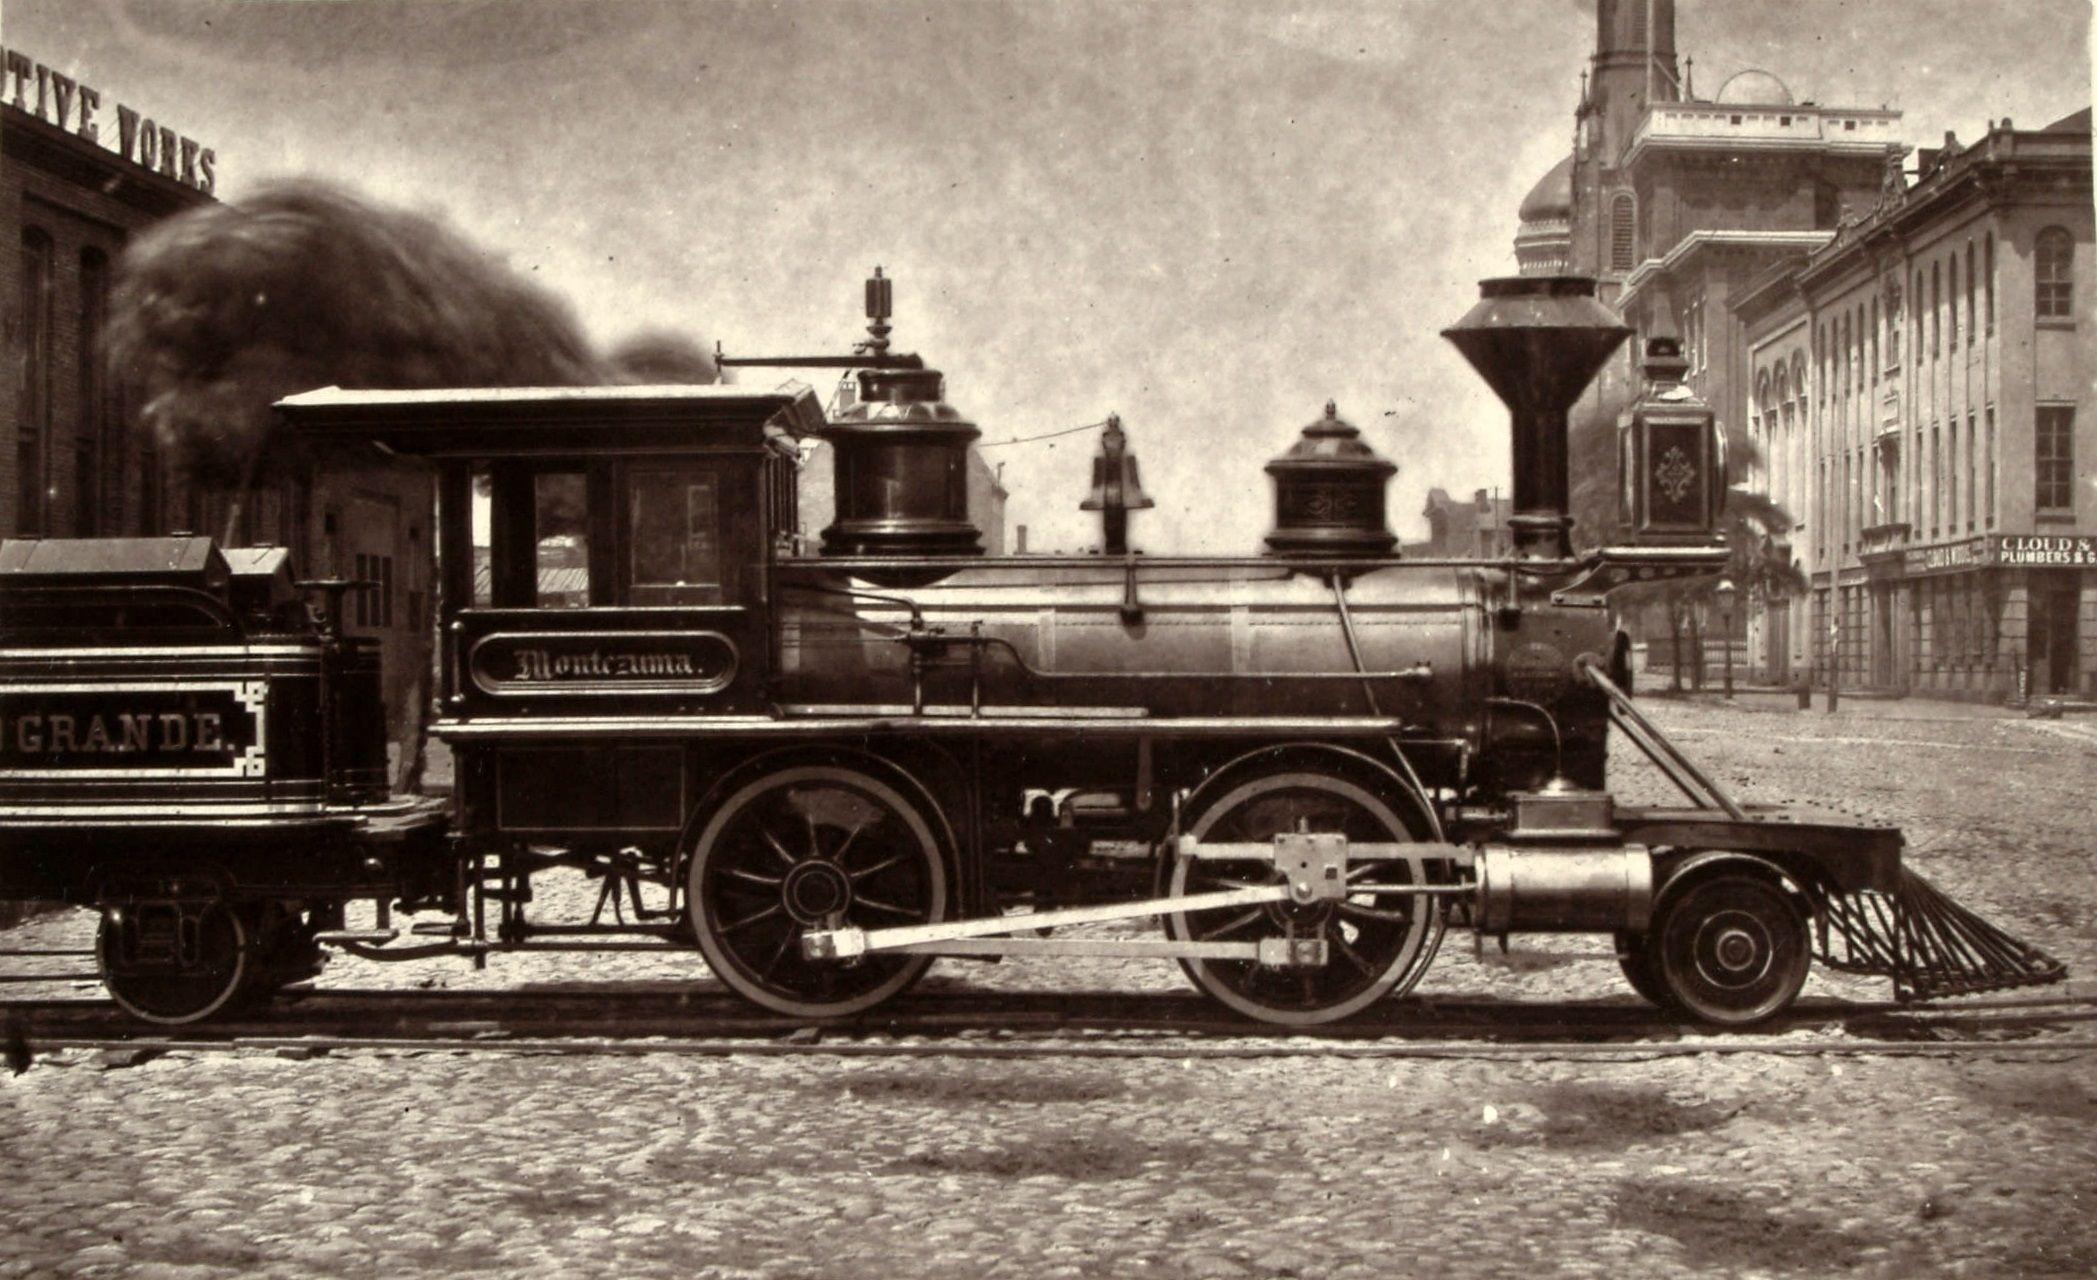 Baldwin's Montezuma, 1871, The first locomotive built for the Denver & Rio Grande.